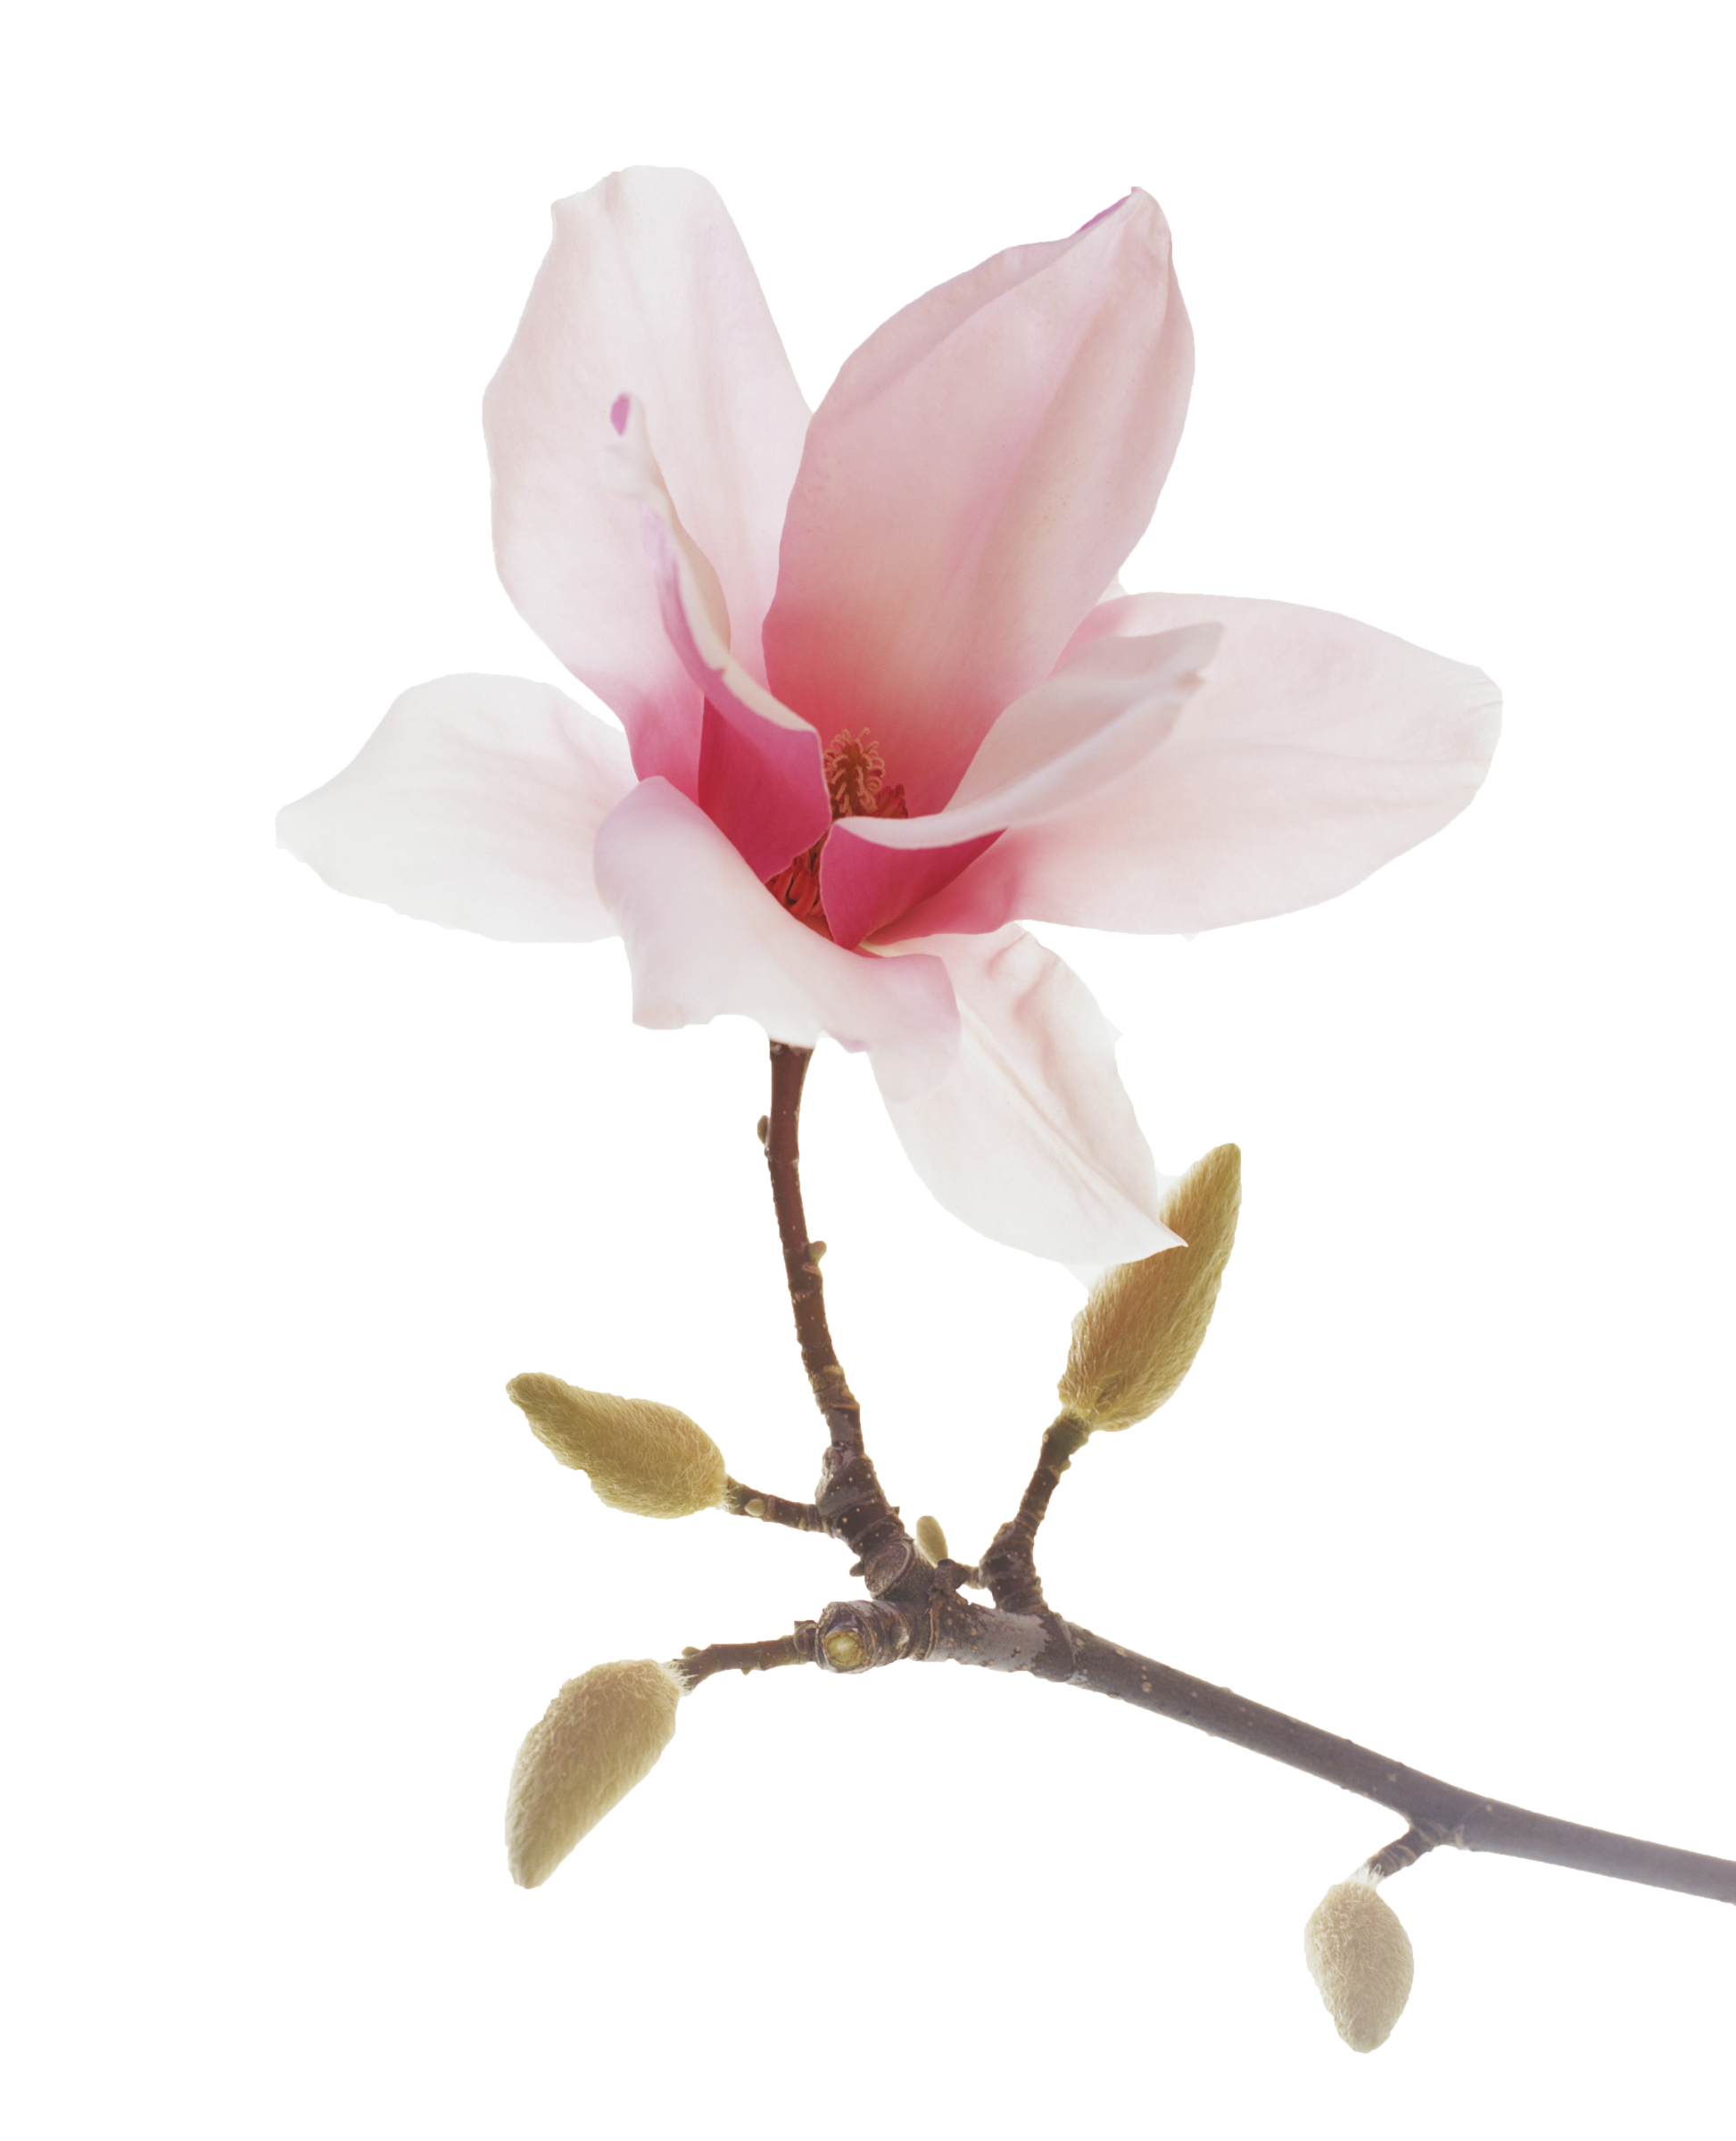 spiritual pinterest and. Louisiana clipart magnolia